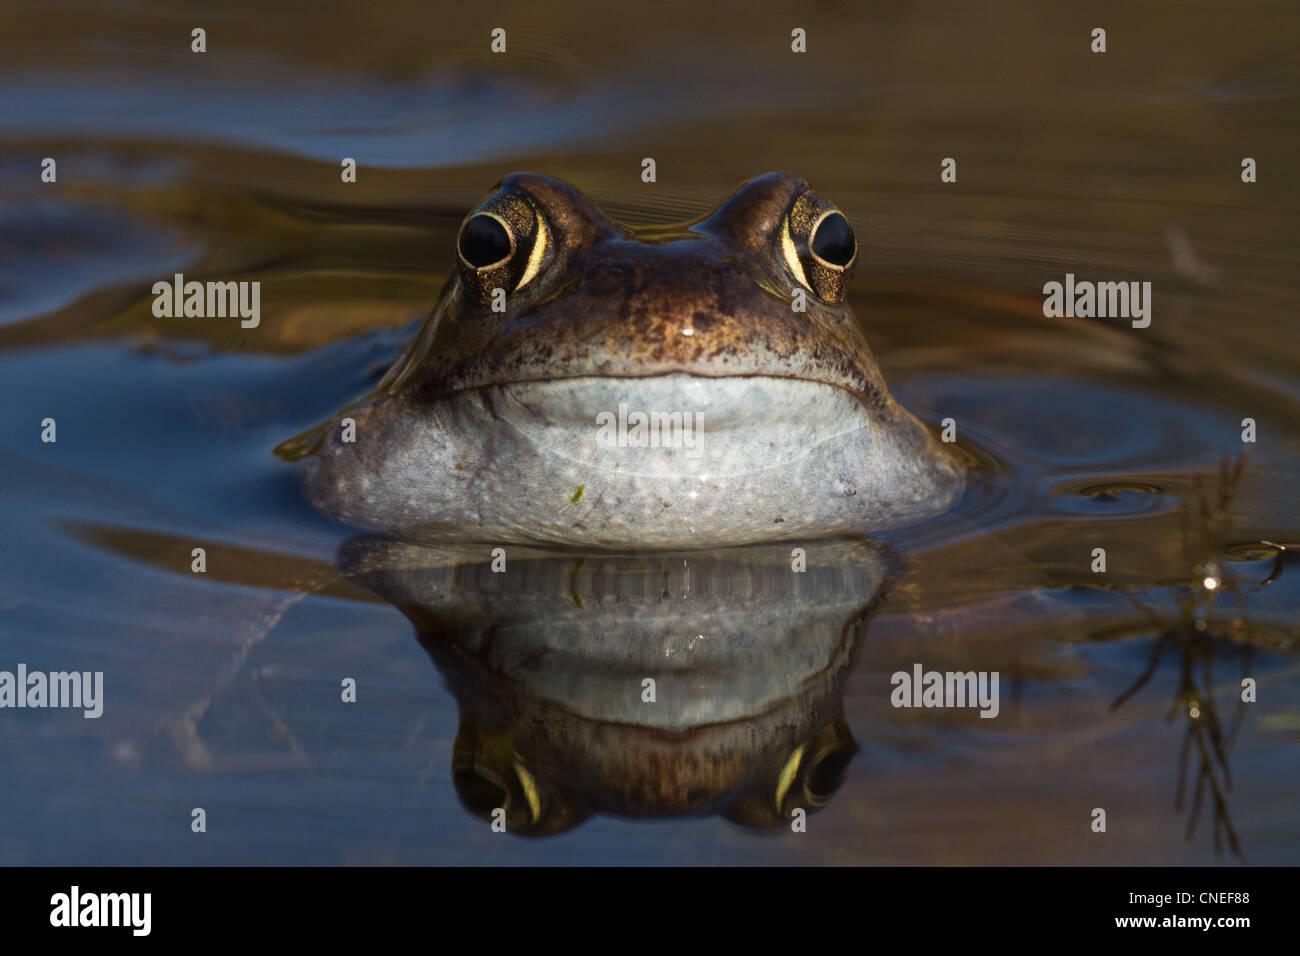 Croaking Common Frog (Rana temporaria) in garden pond, Cambridgeshire, England - Stock Image